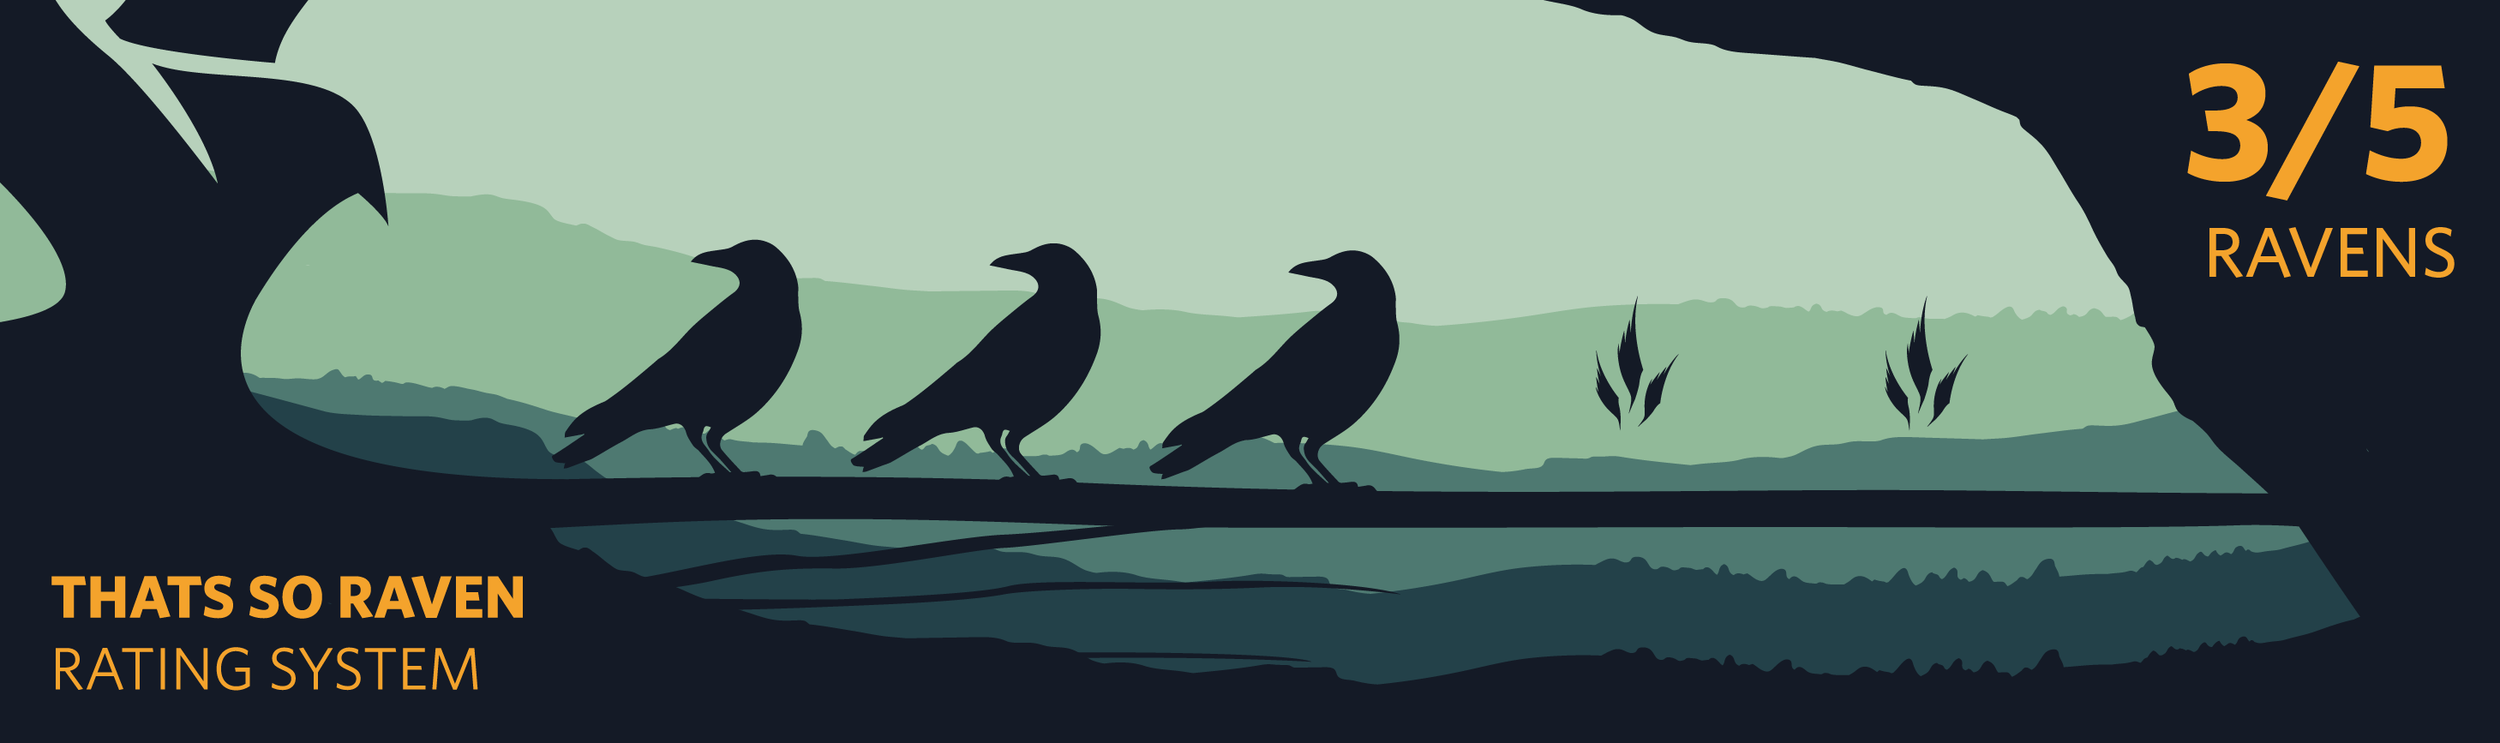 3-ravens